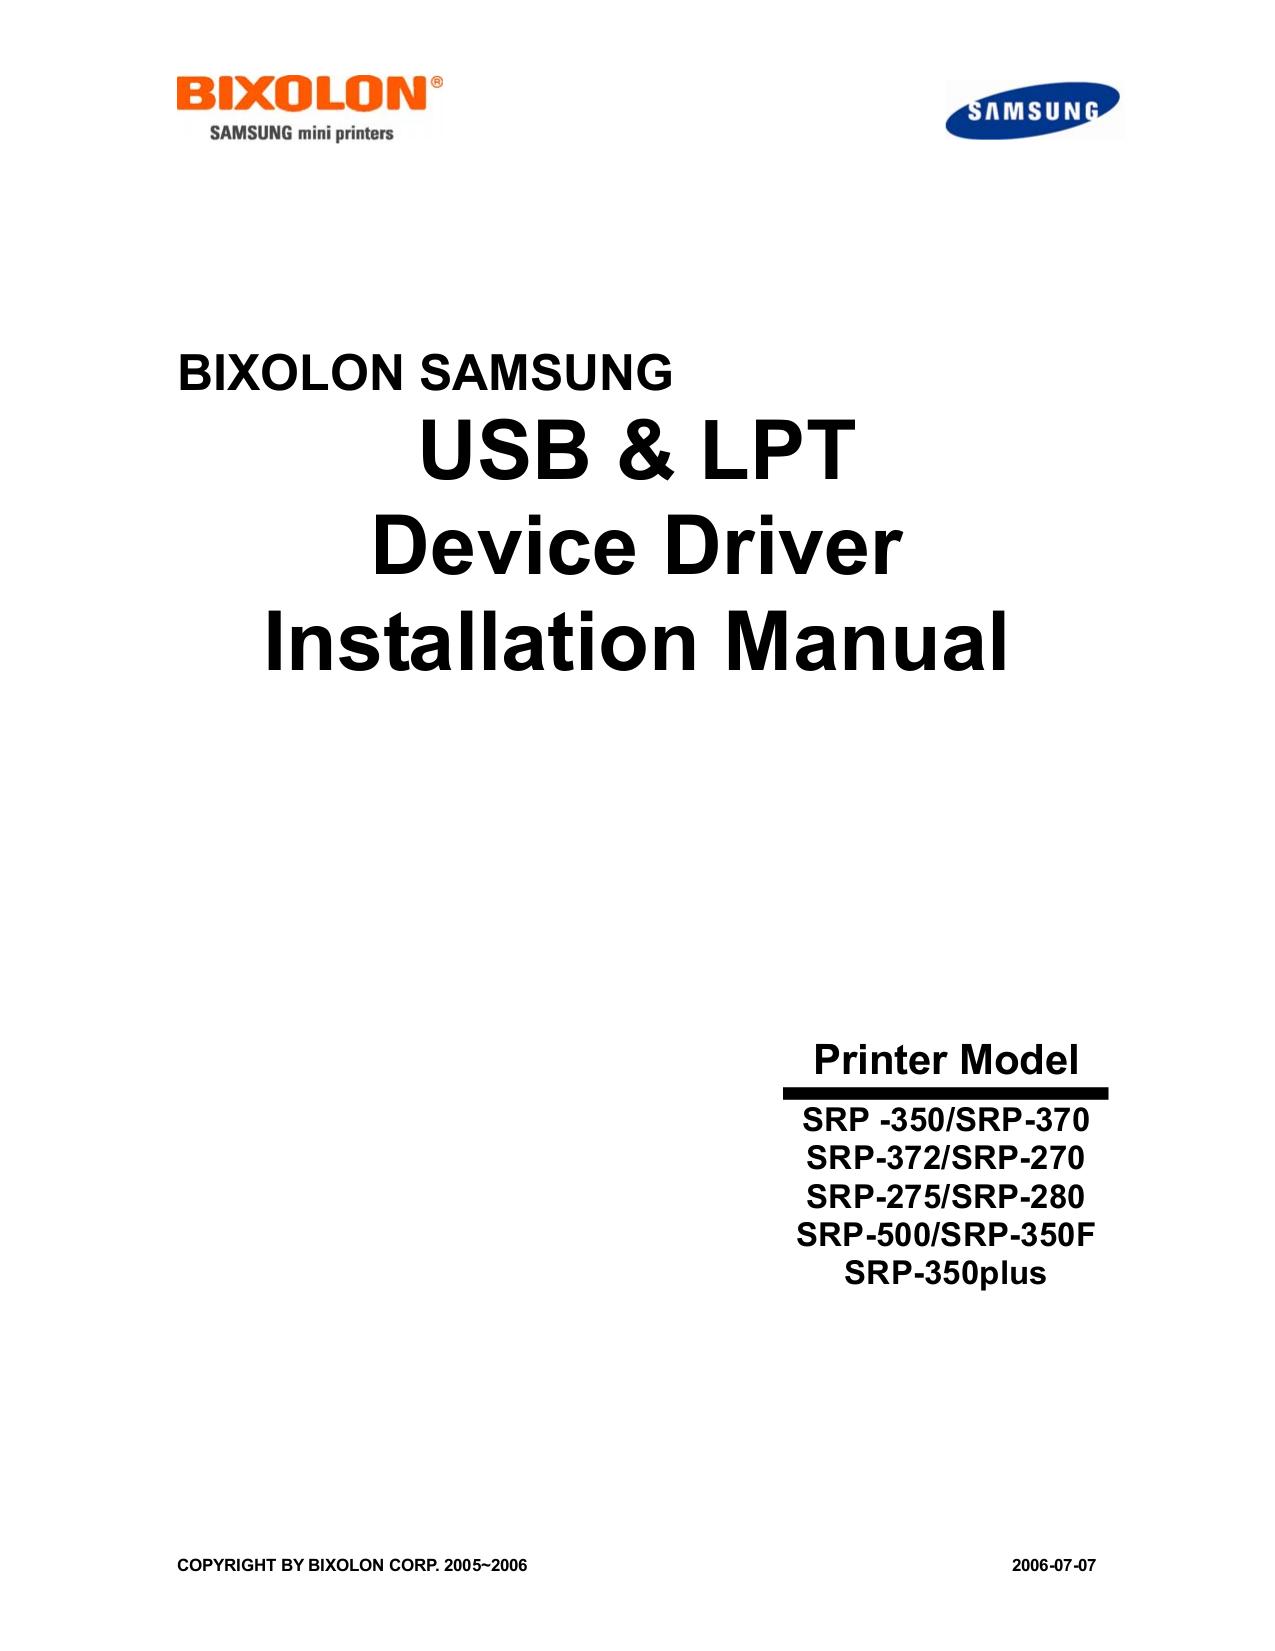 pdf for Samsung Printer SRP-500 manual